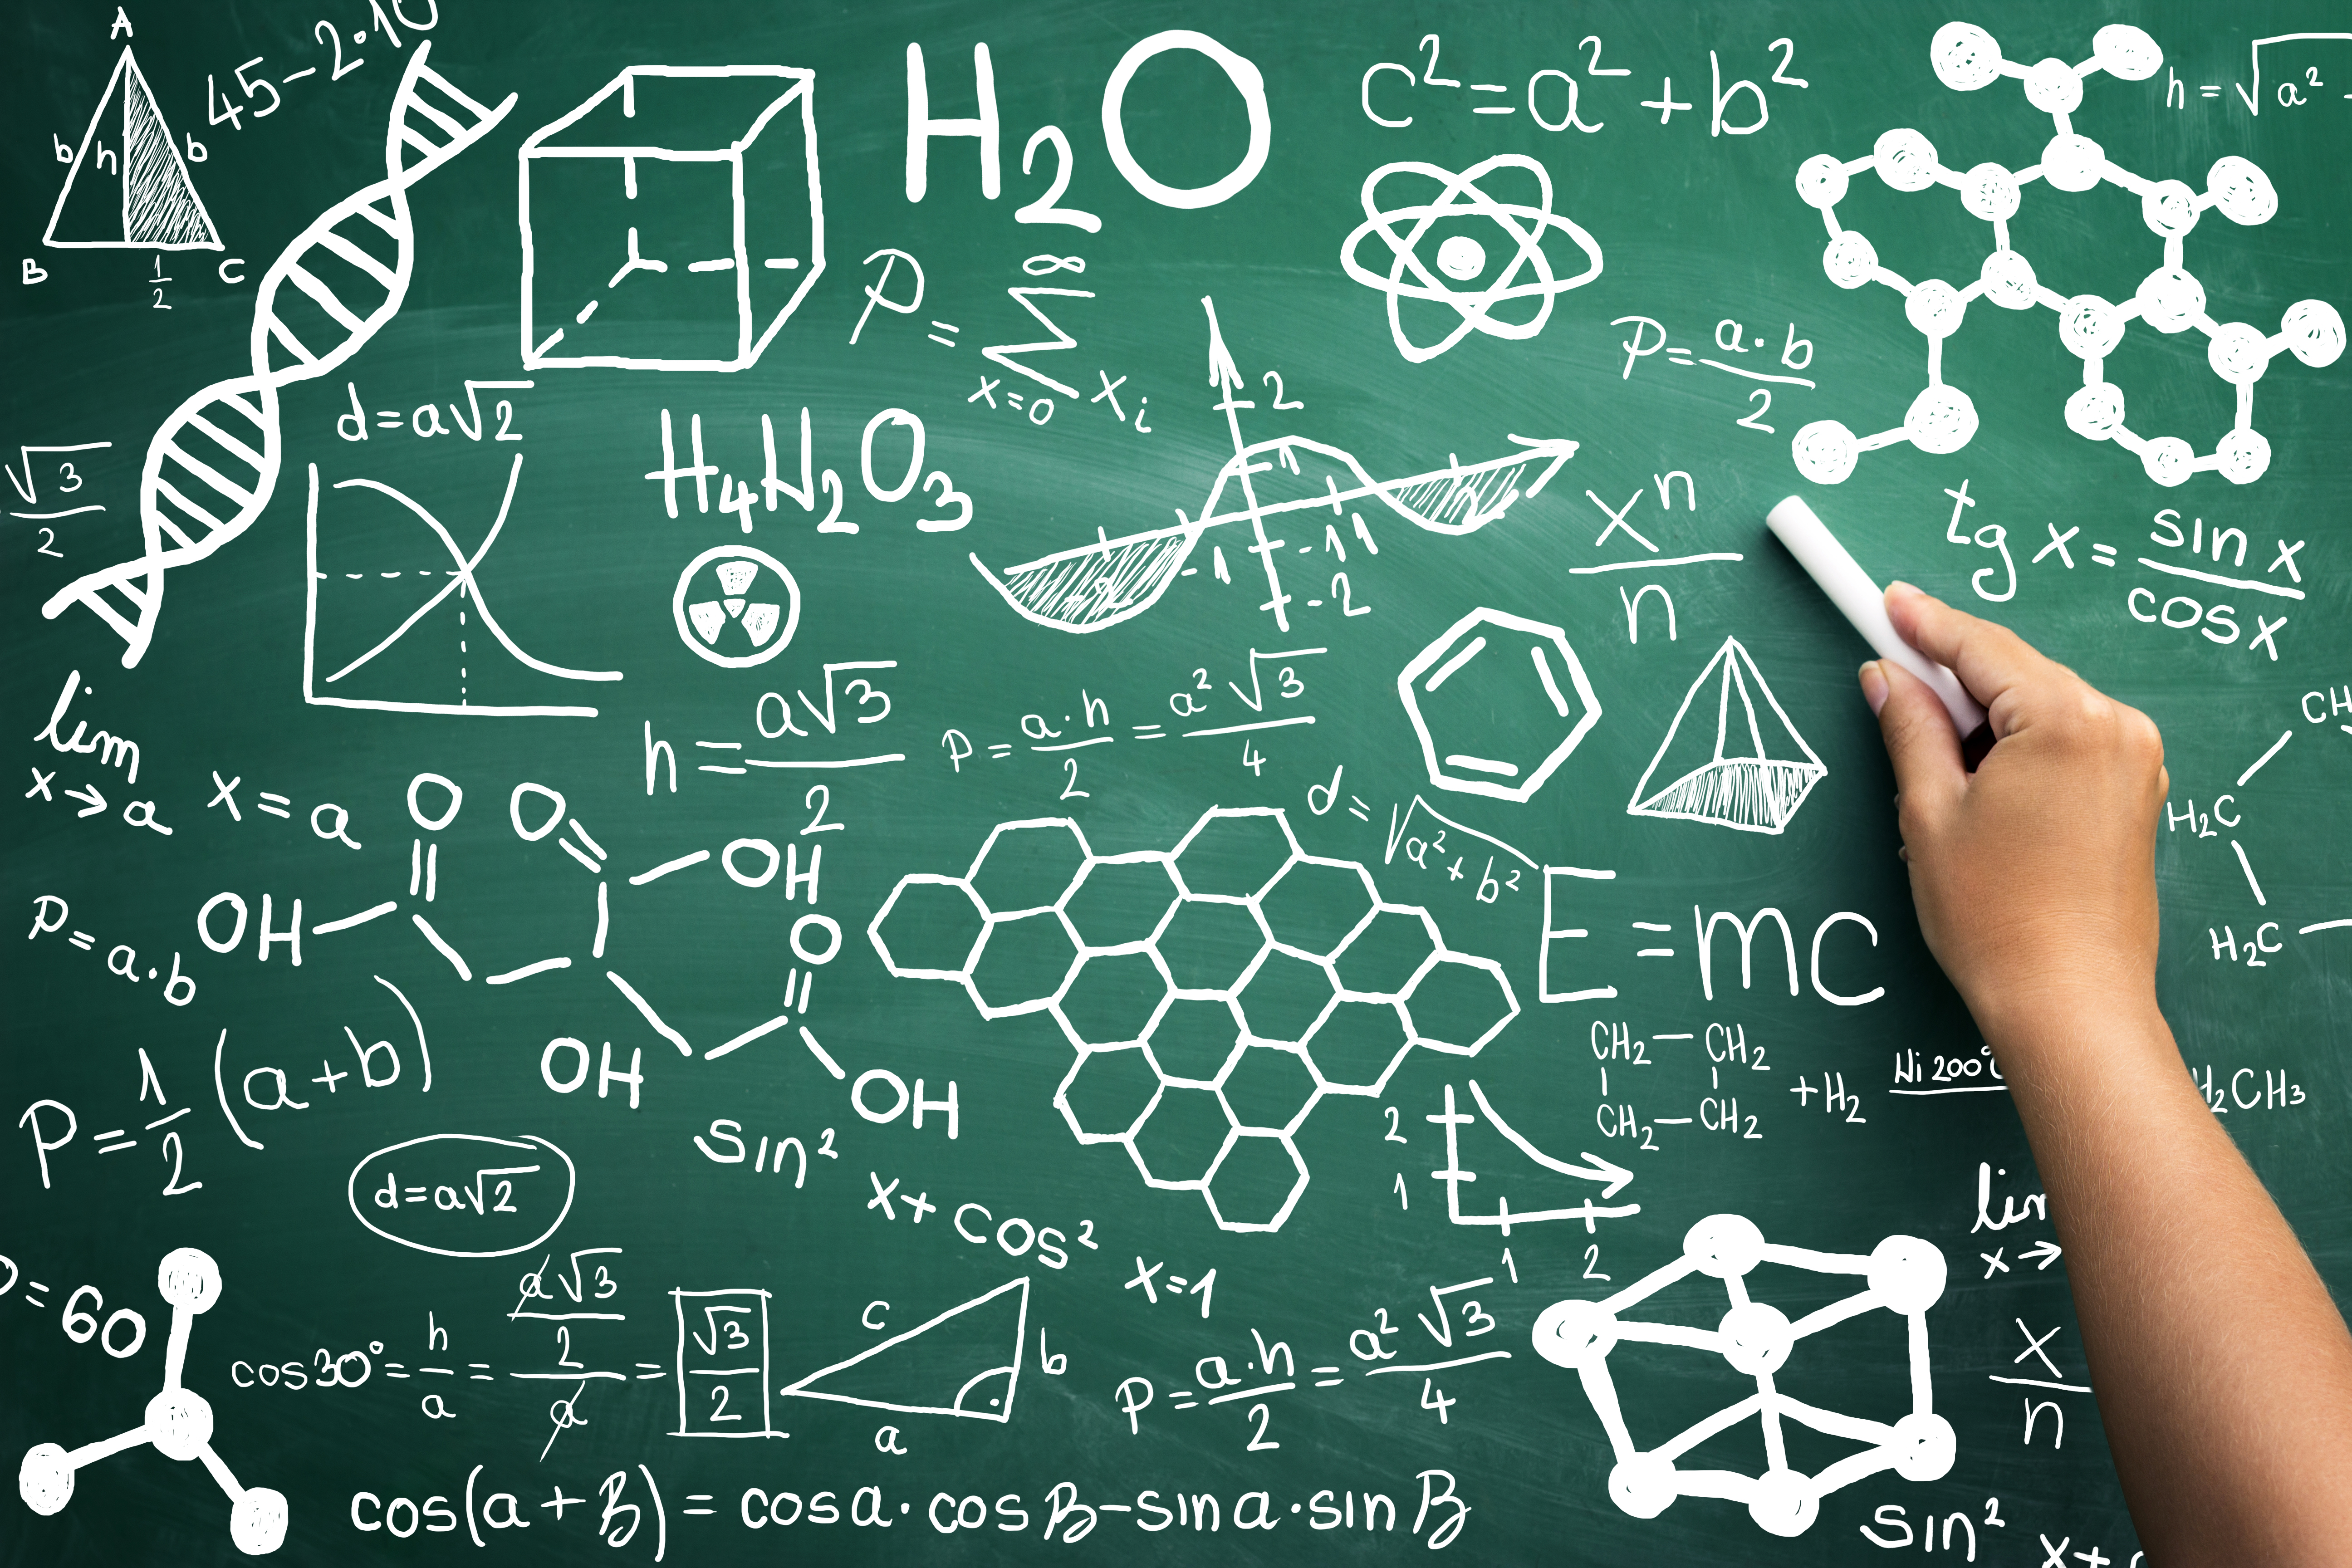 physics scientific formulas degree stream teaching eureka moment method stand progressives finding science careers education blackboard